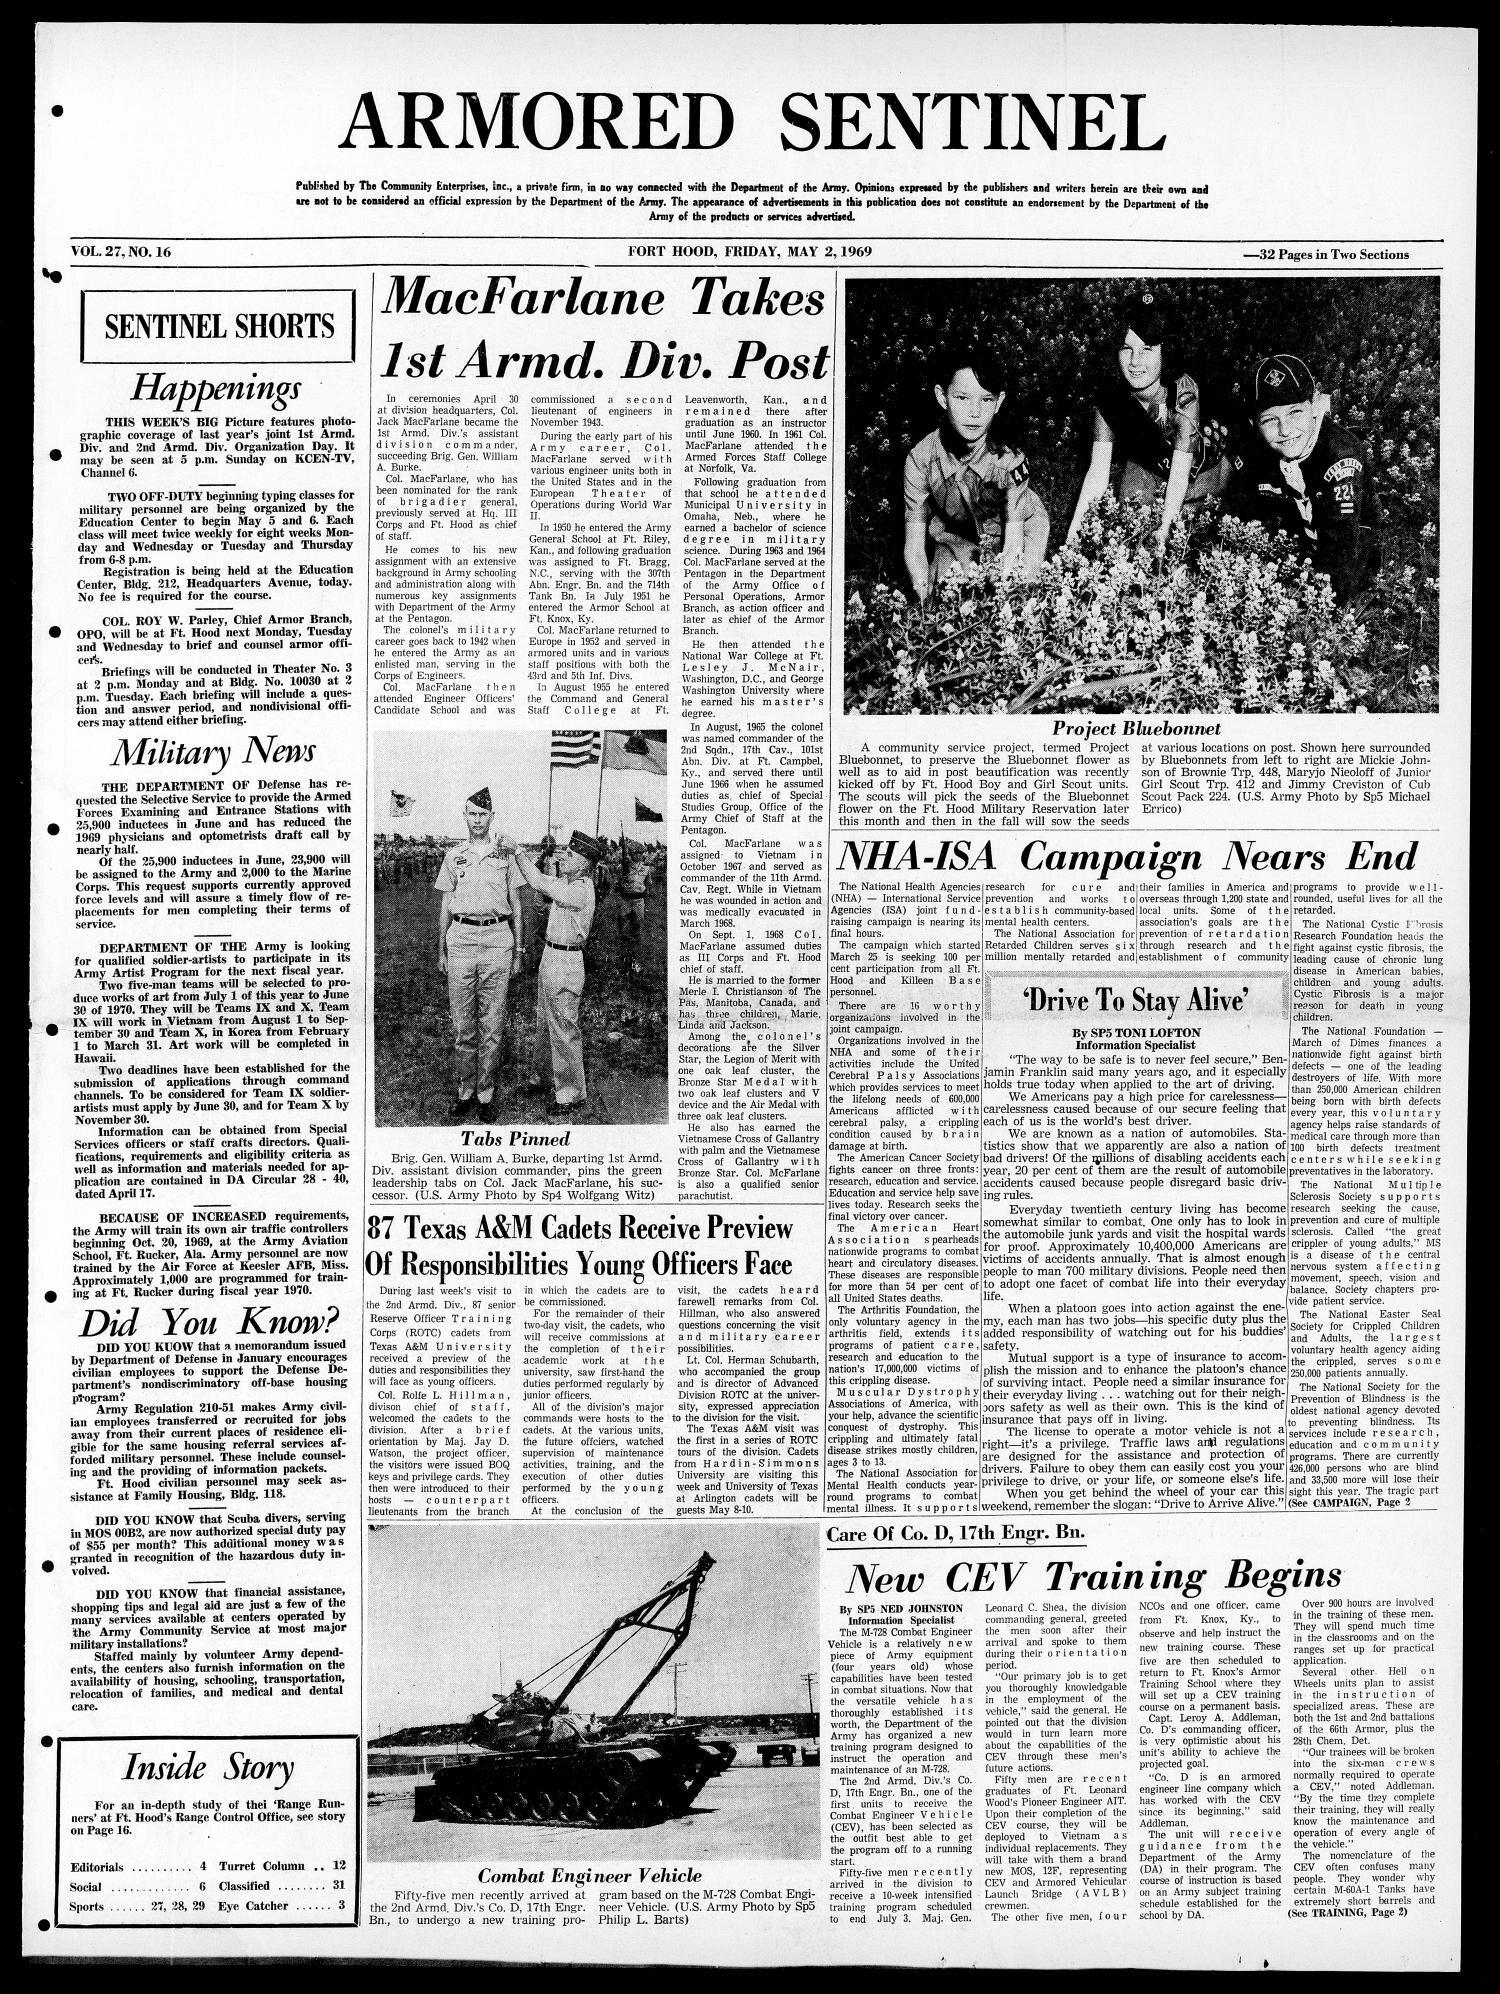 ARMORED SENTINEL_2 MAY 1969.jpg